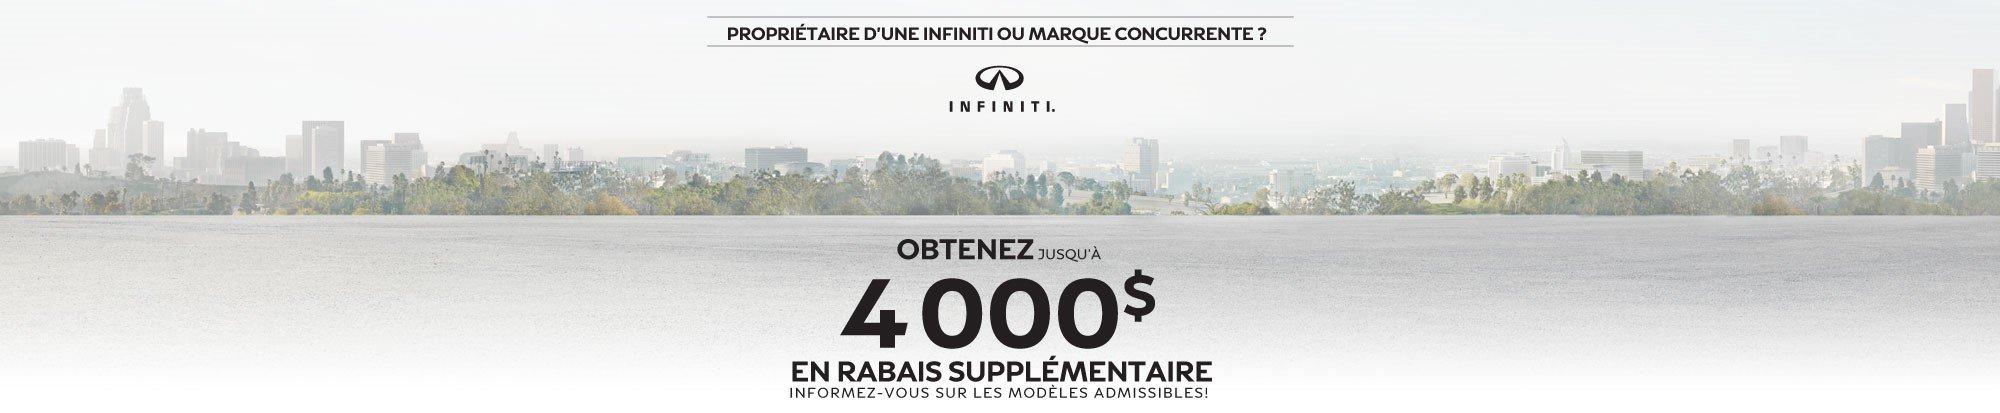 Solde final Infiniti